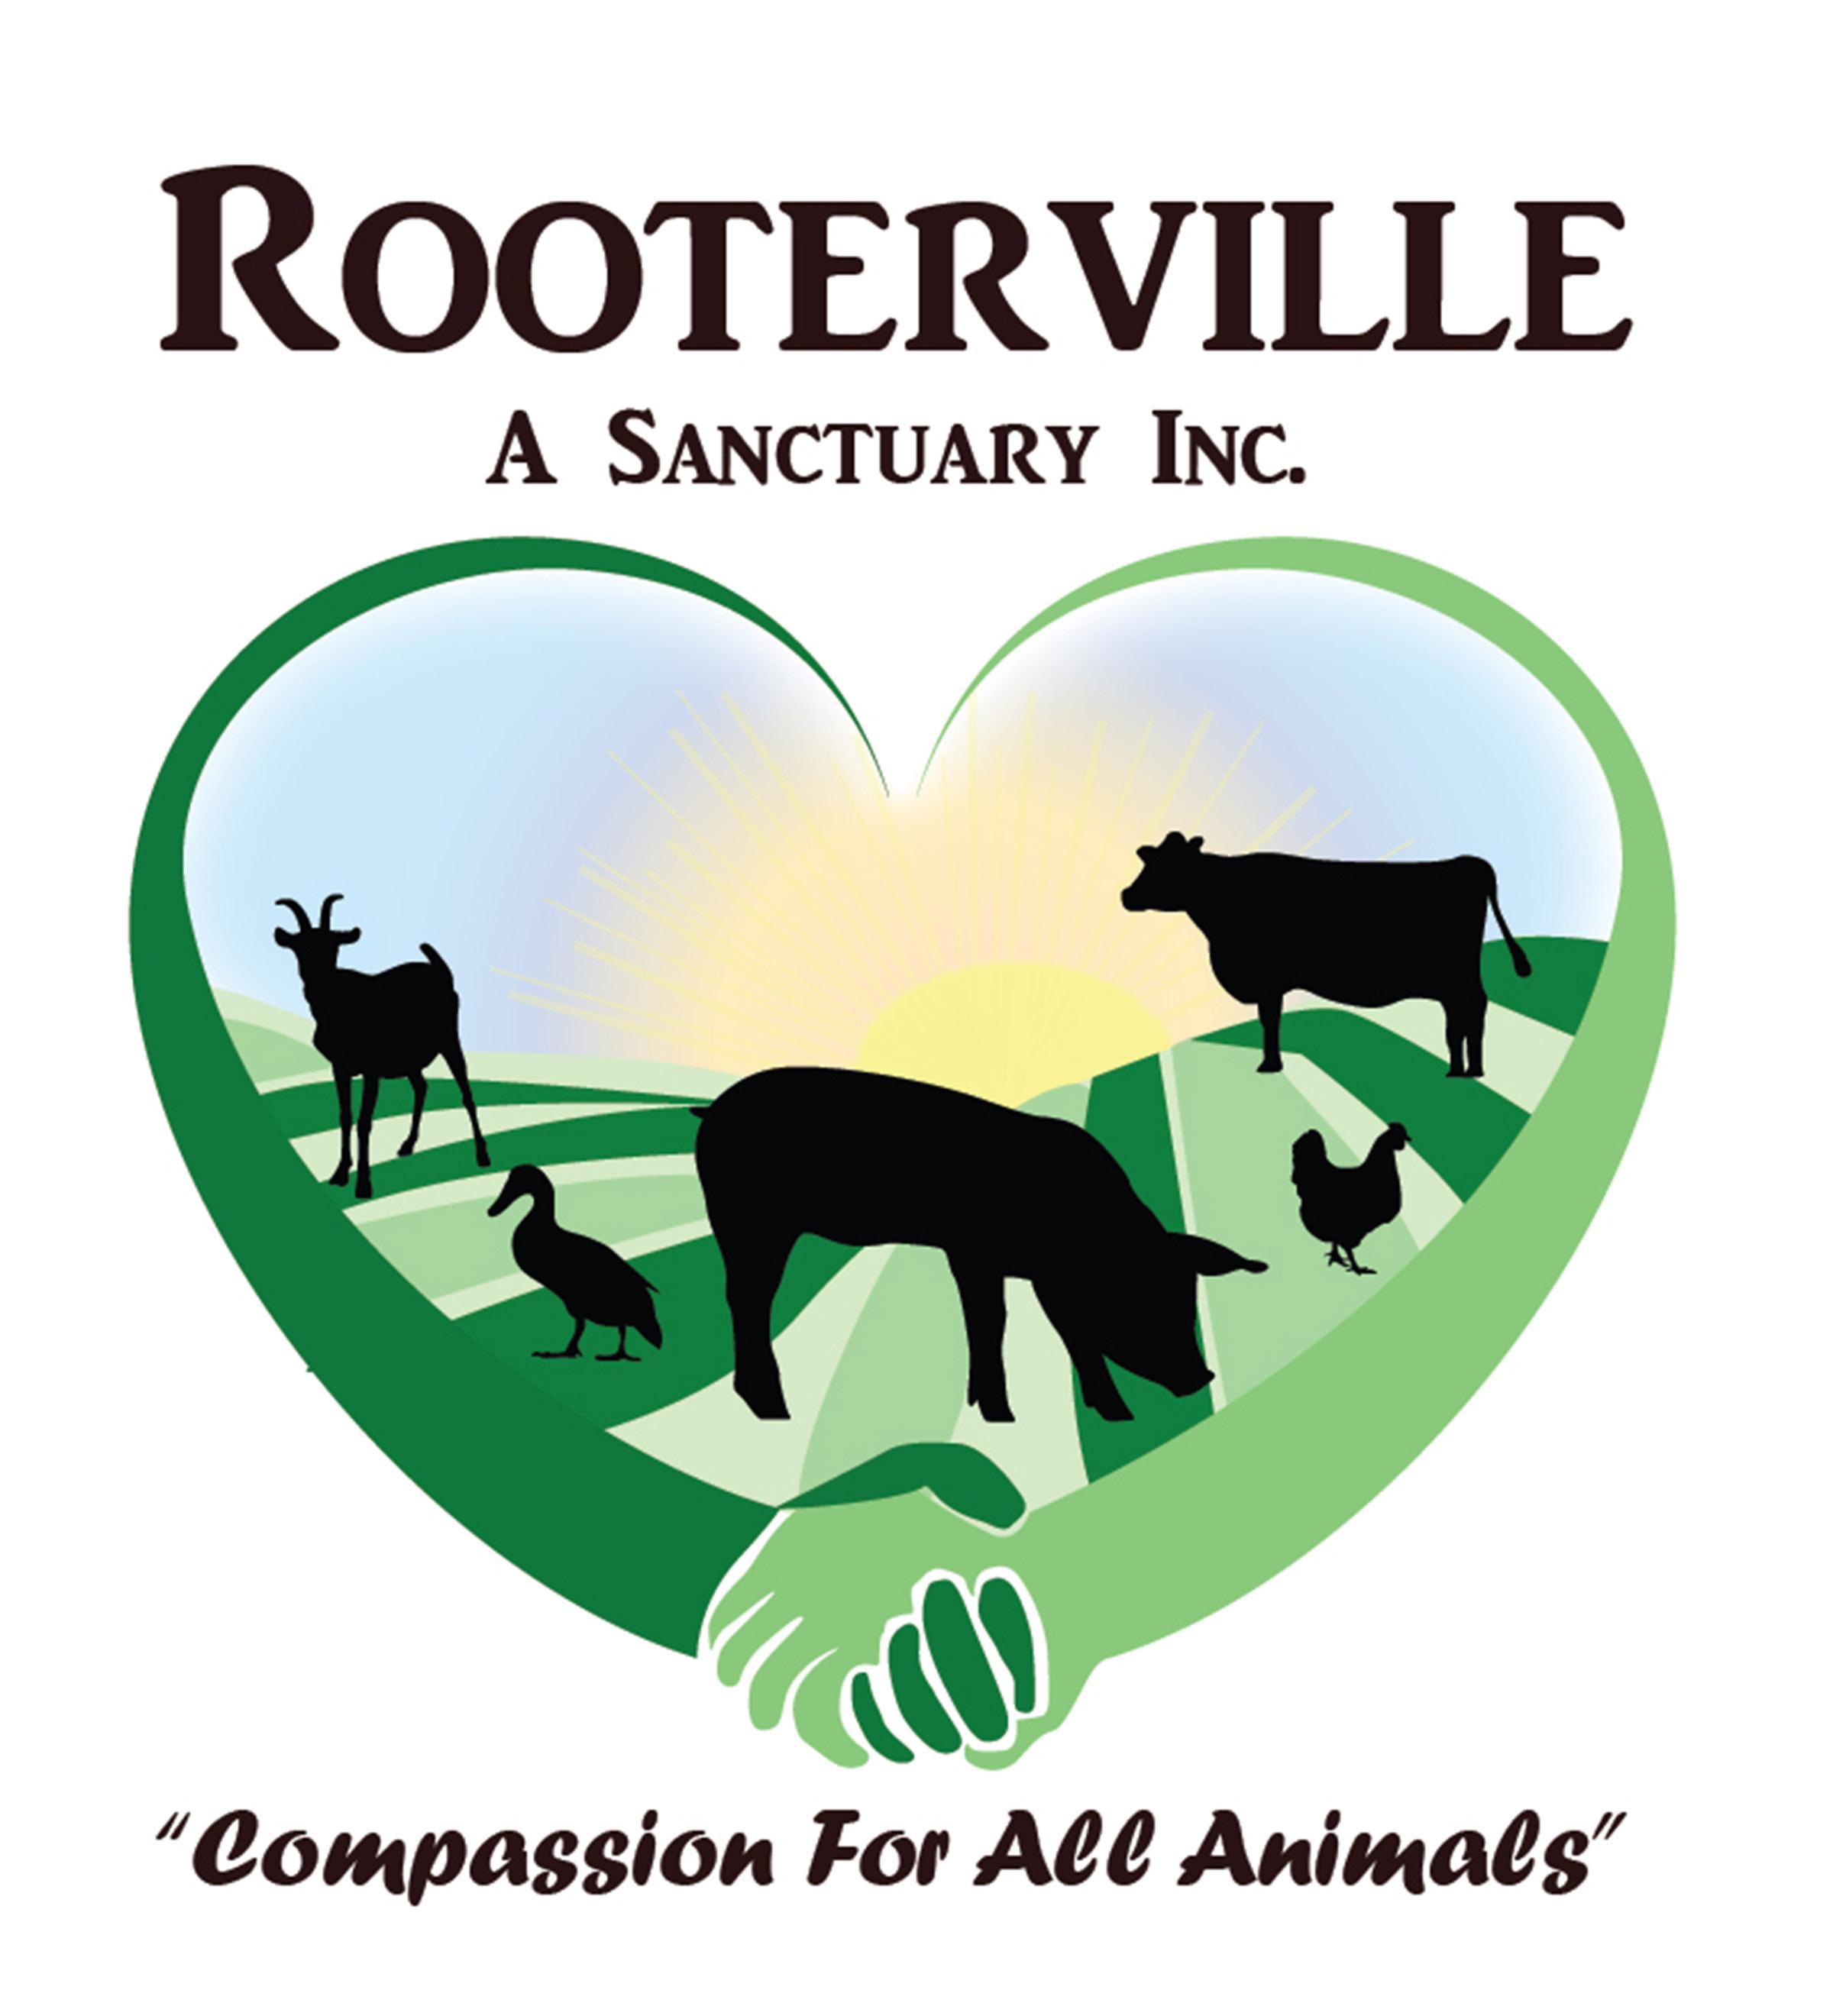 Rooterville A Sanctuary's Logo